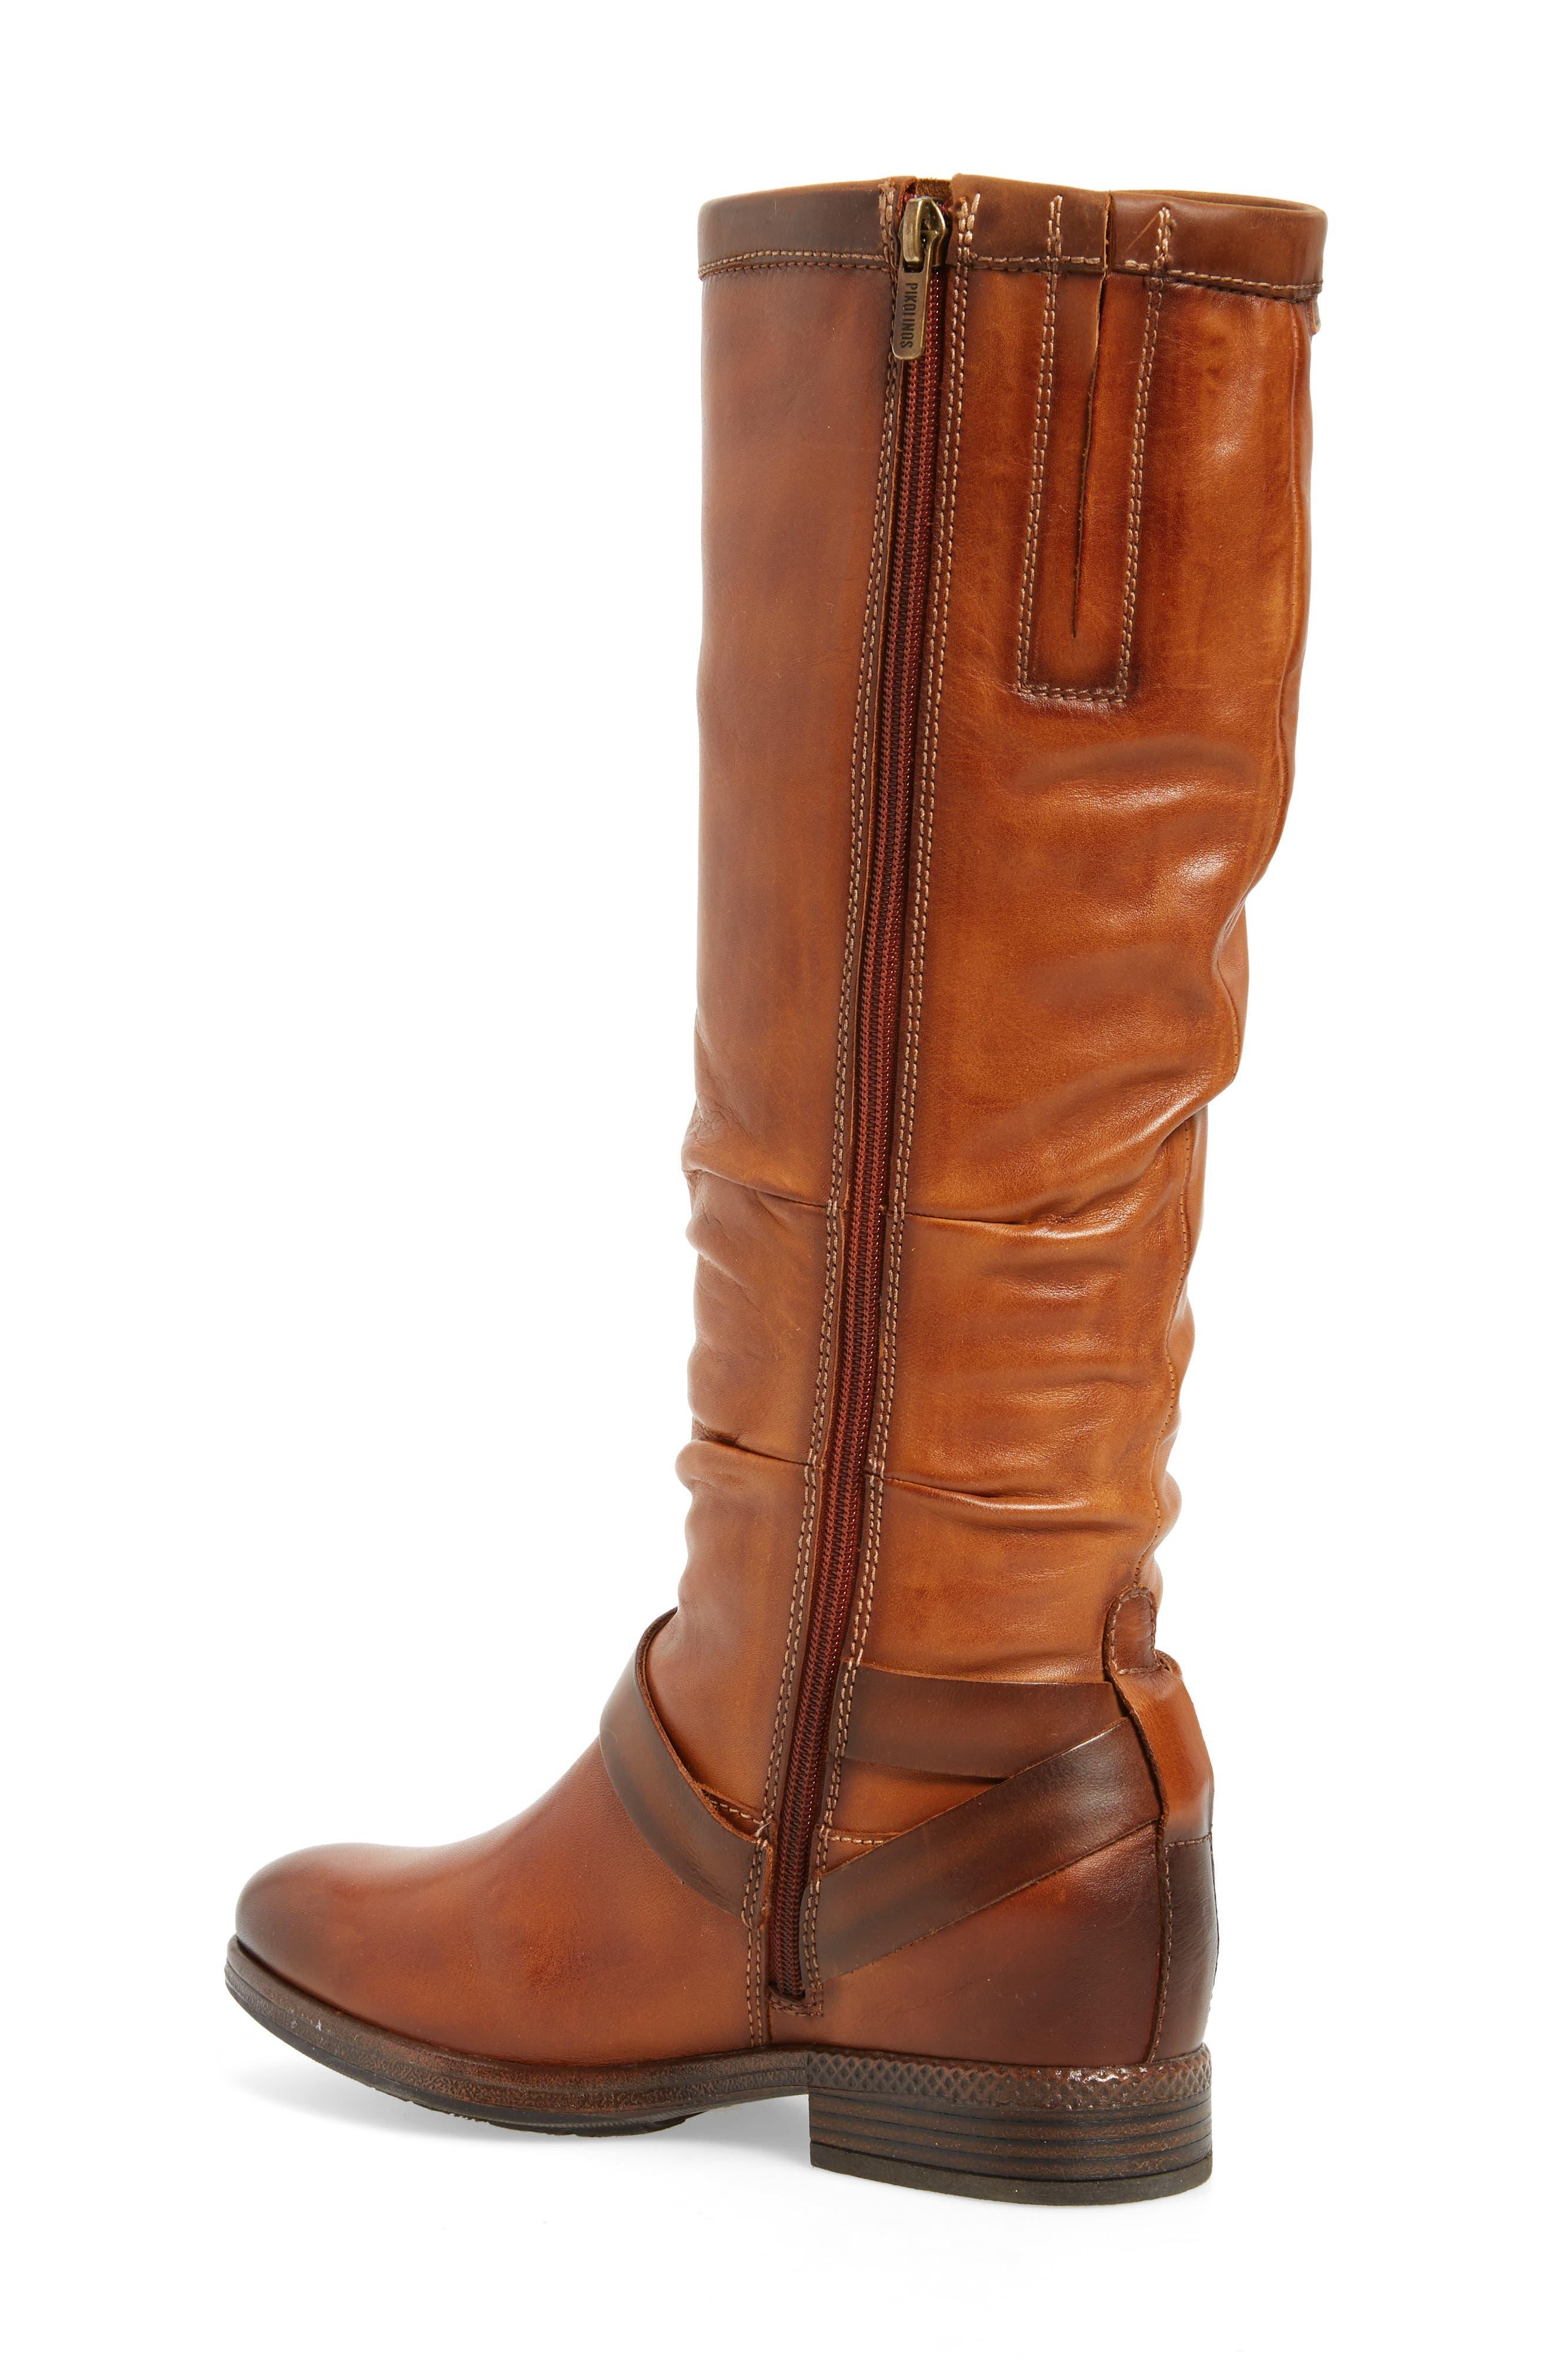 Ordino Knee High Boot,                             Alternate thumbnail 2, color,                             Brandy Cuero Leather